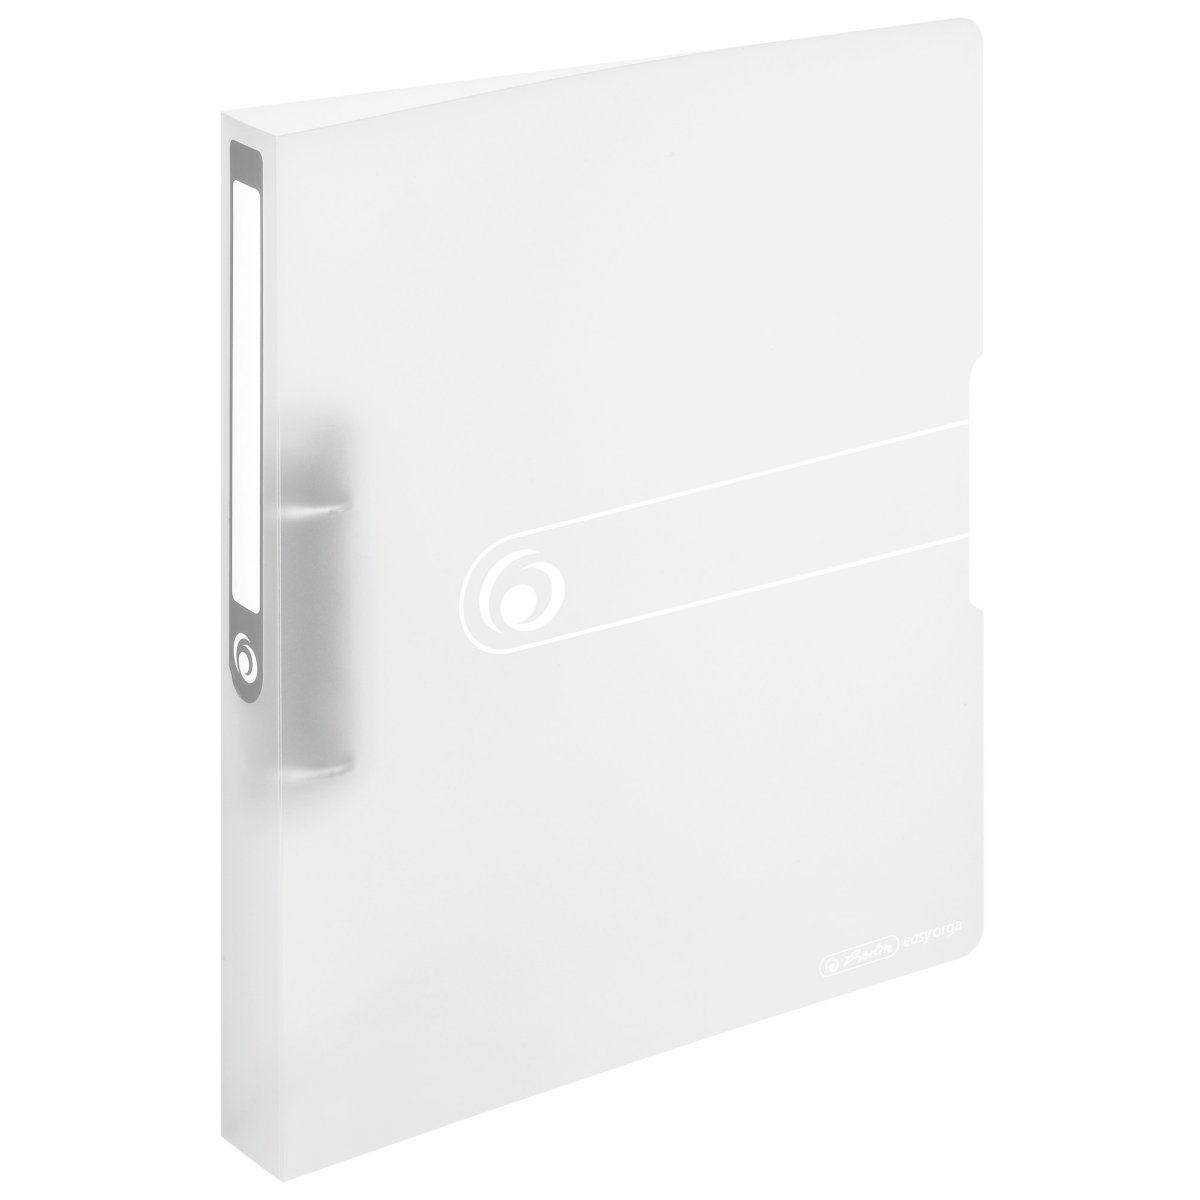 Herlitz 11205770 - Ringbuch - Ordner - Polypropylen - DIN A4 - Transparent